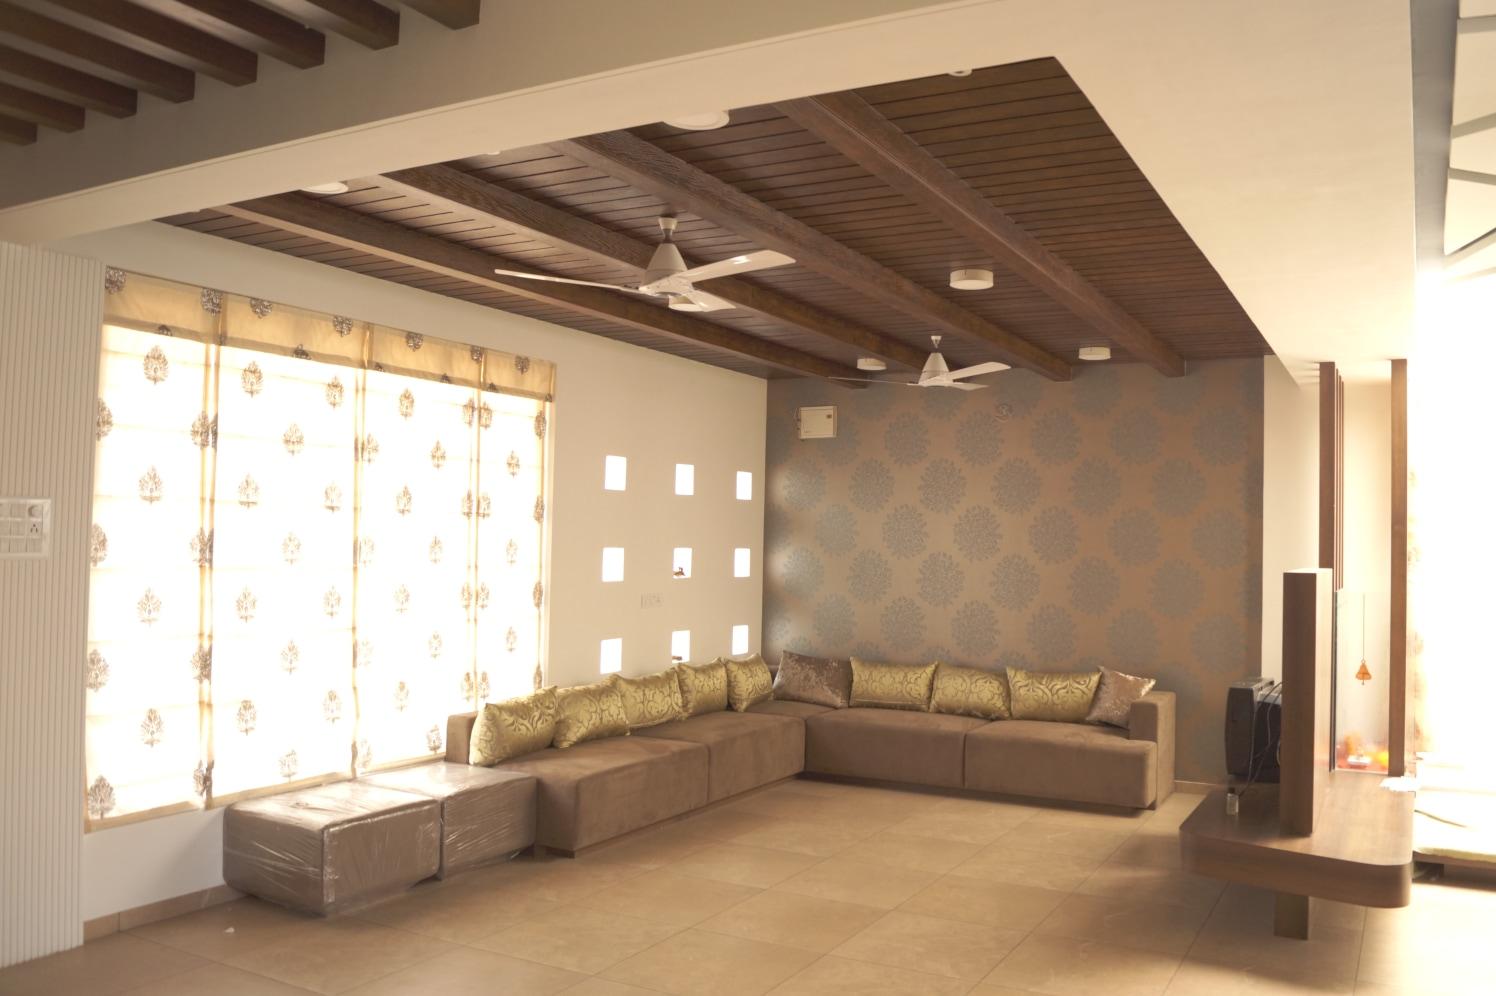 Urban Layout by Ankit Atkotiya Modern | Interior Design Photos & Ideas